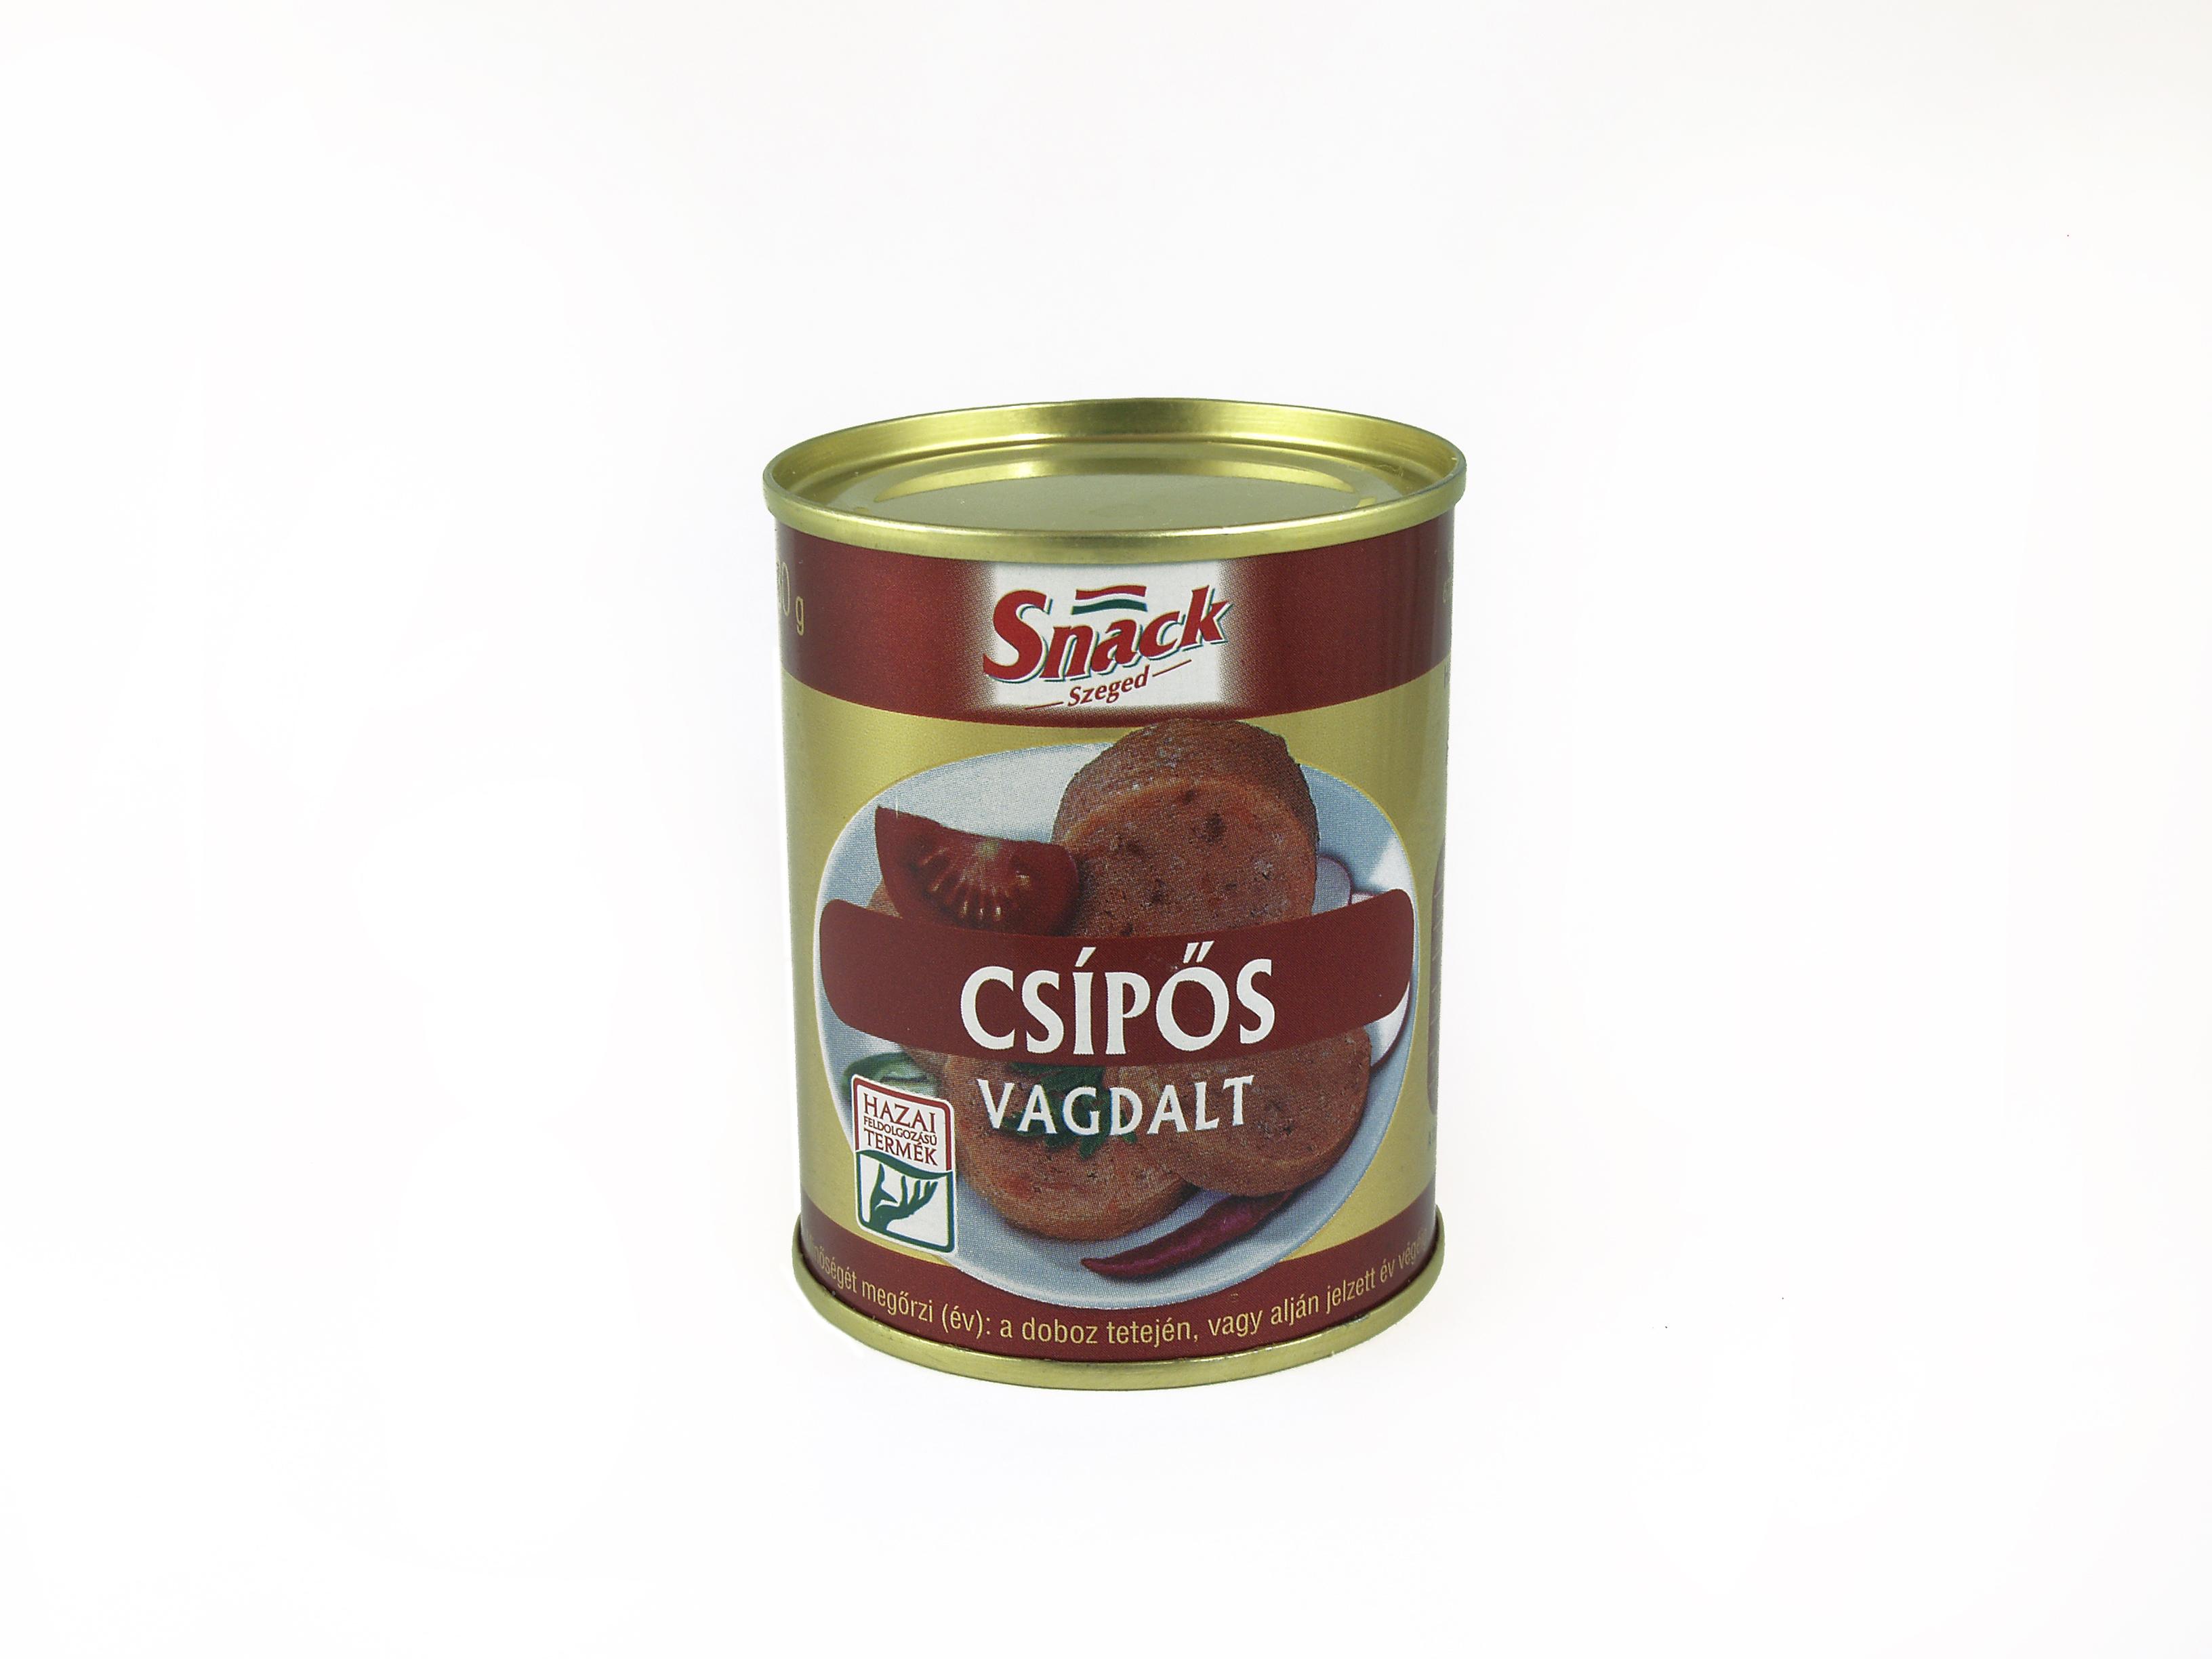 """Snack"" Csípős vagdalt 130g"